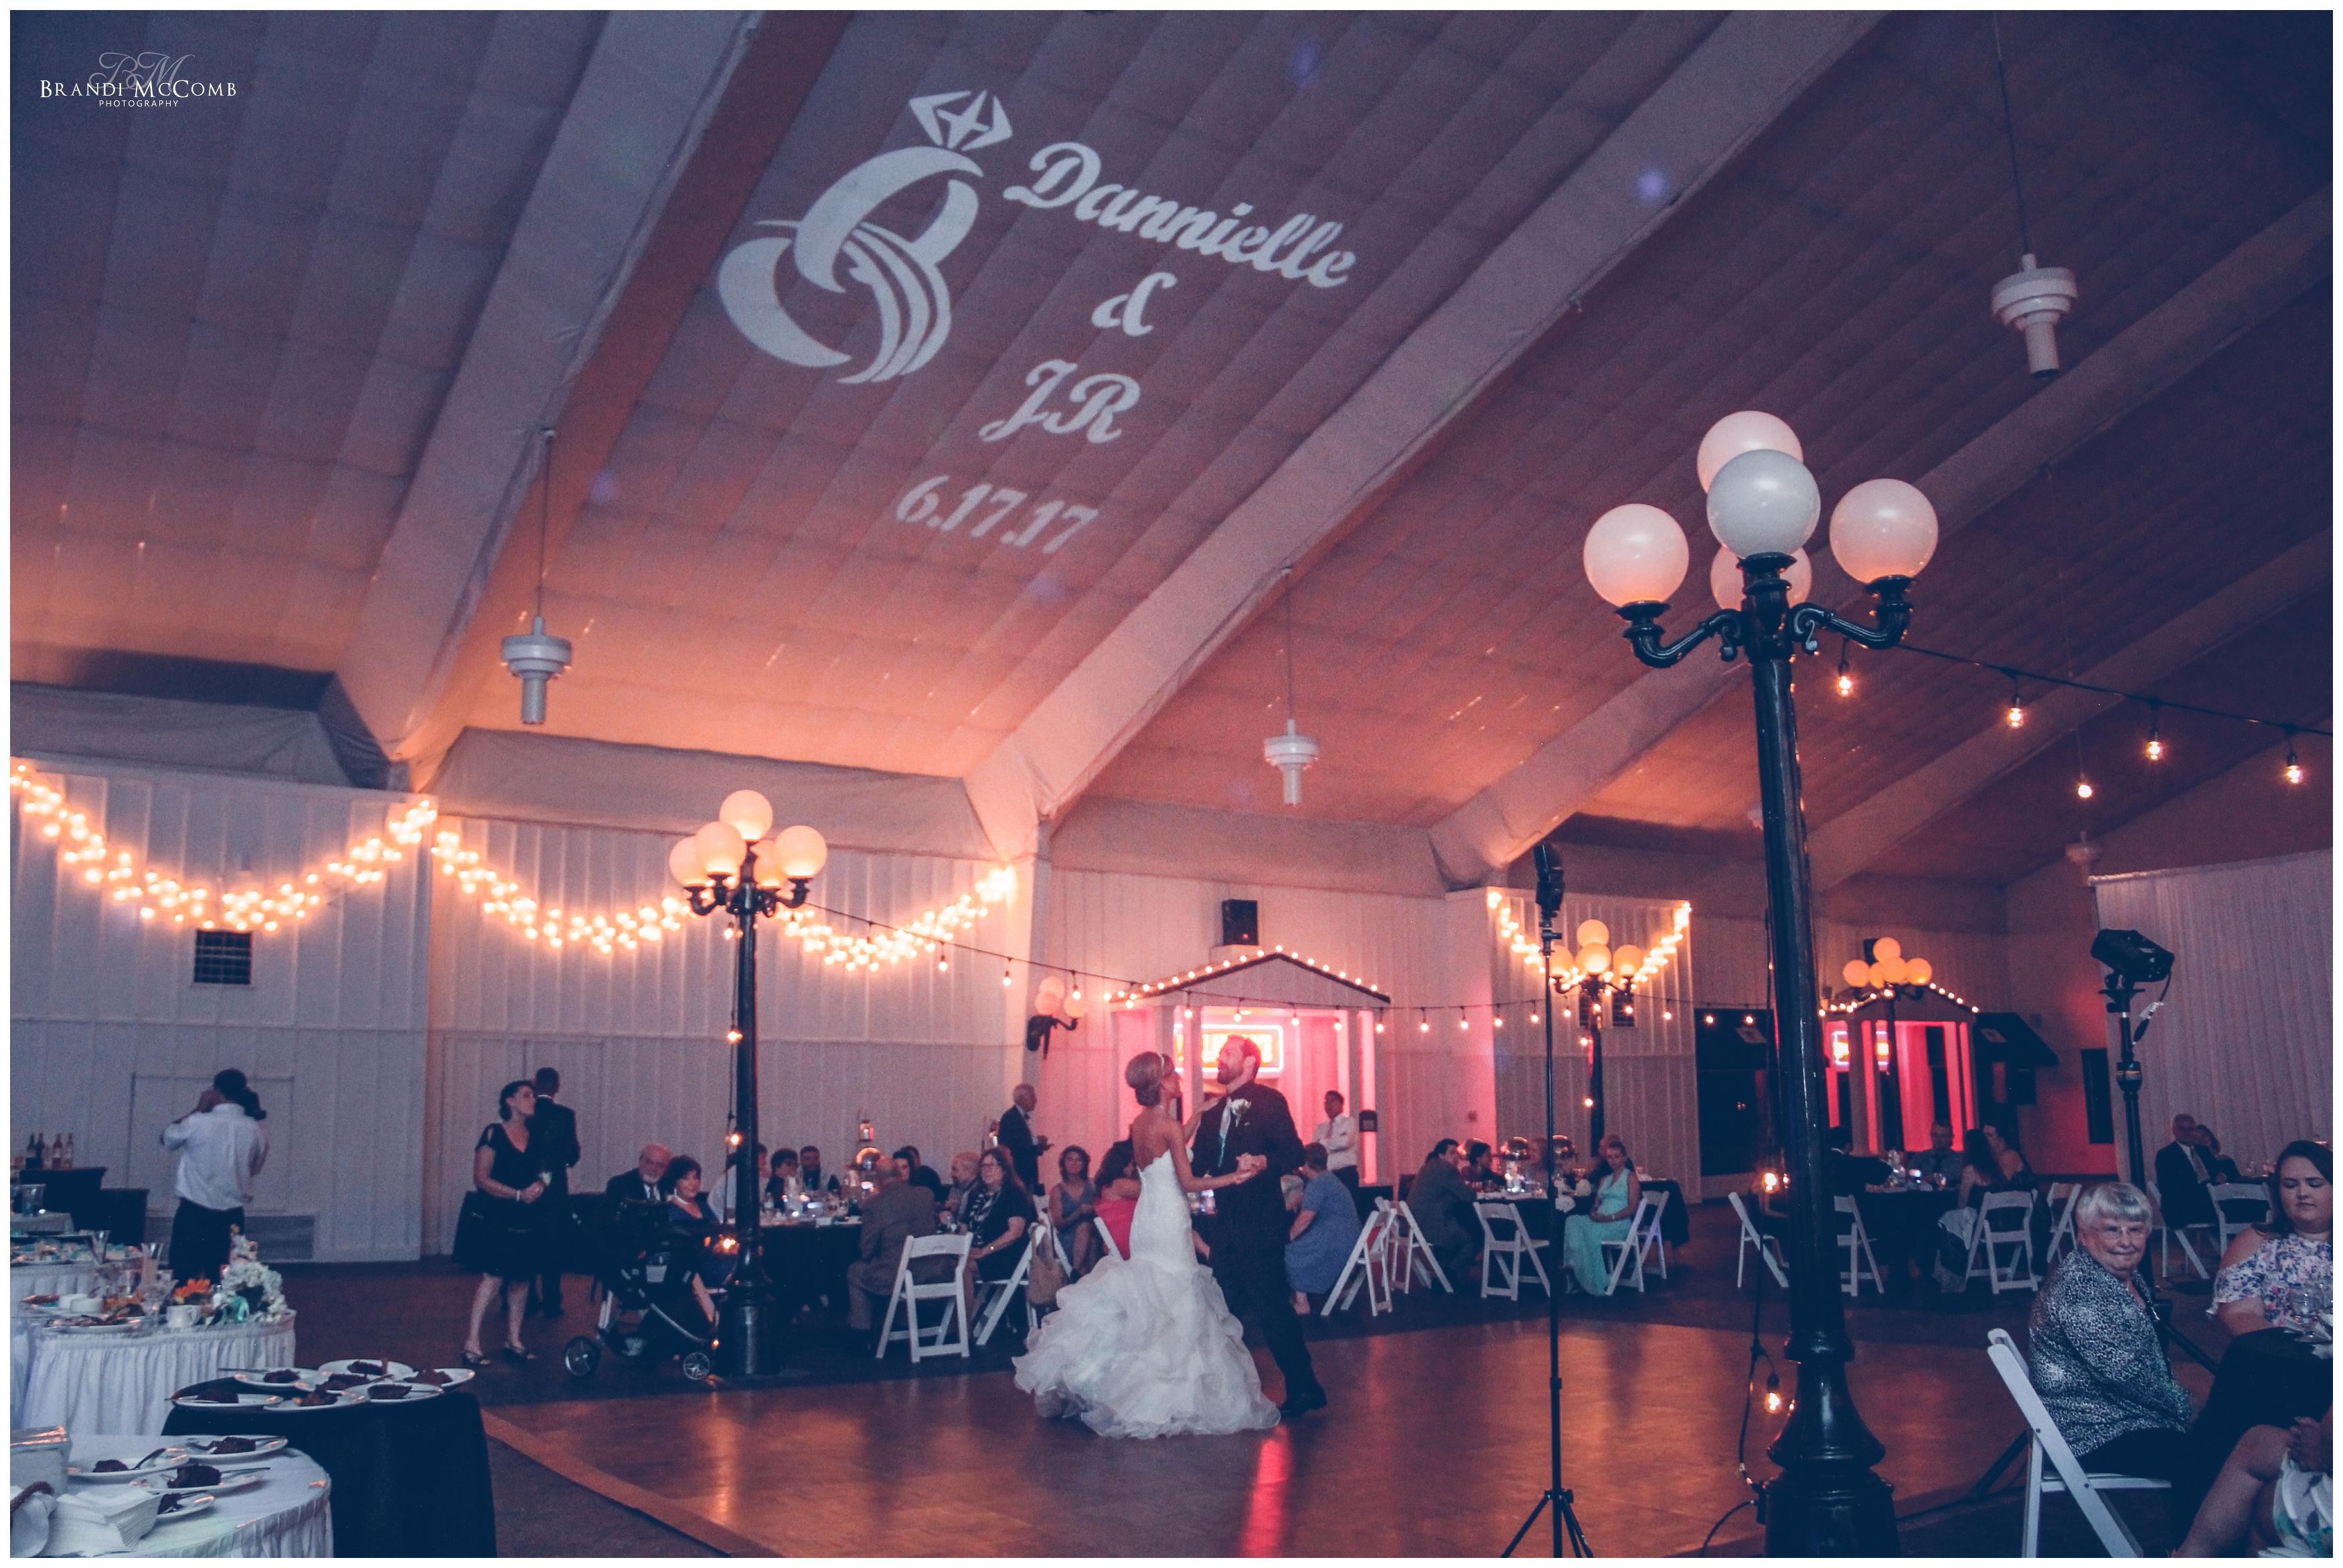 Dannielle & JR\'s wedding at Southfork Ranch